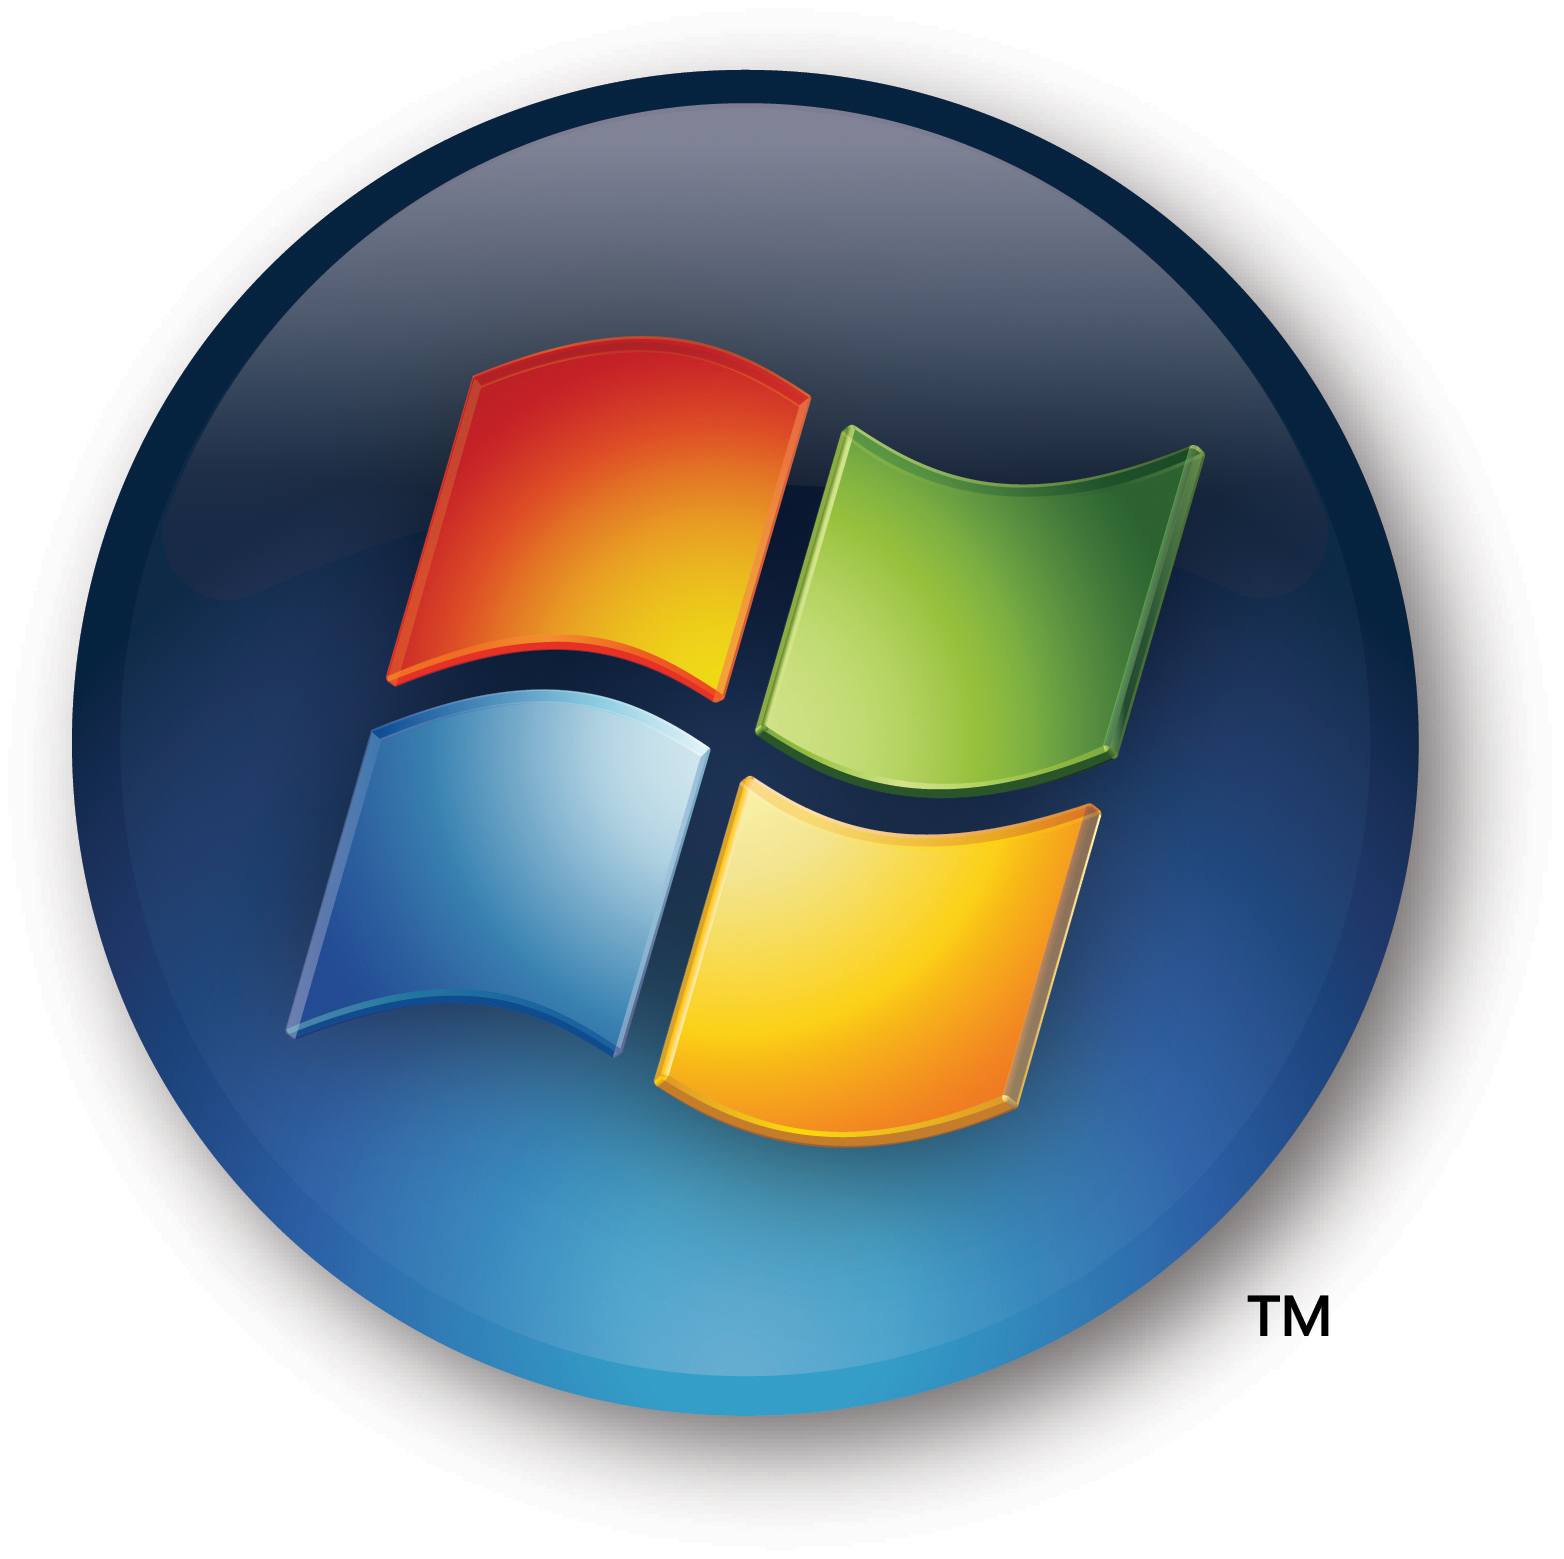 https://i2.wp.com/wiggler.gr/wp-content/microsoft-windows-vista-logo.jpg